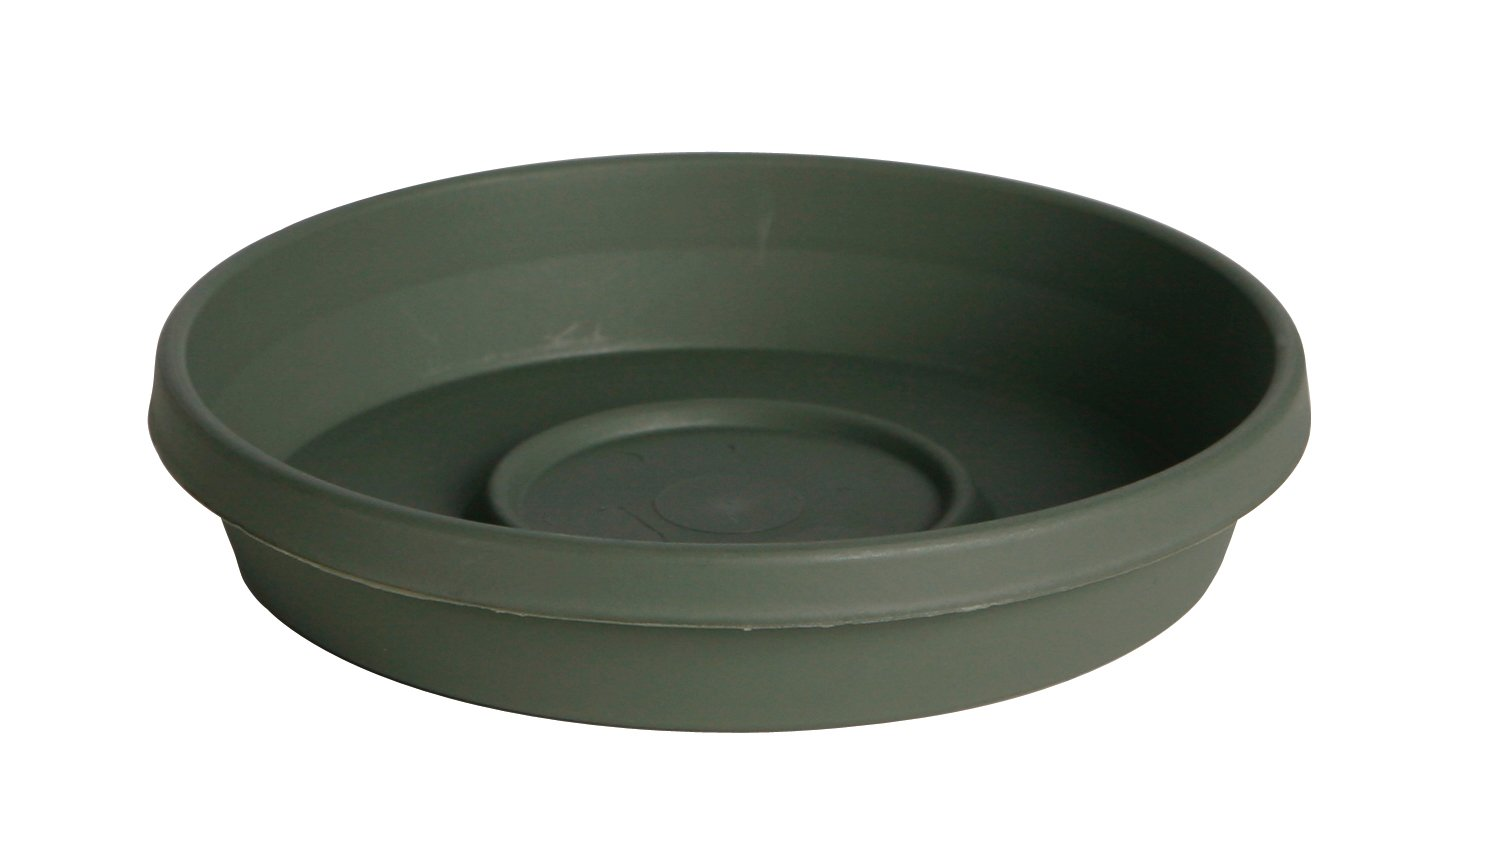 "Bloem Terra Plant Saucer Tray 13"" Living Green"